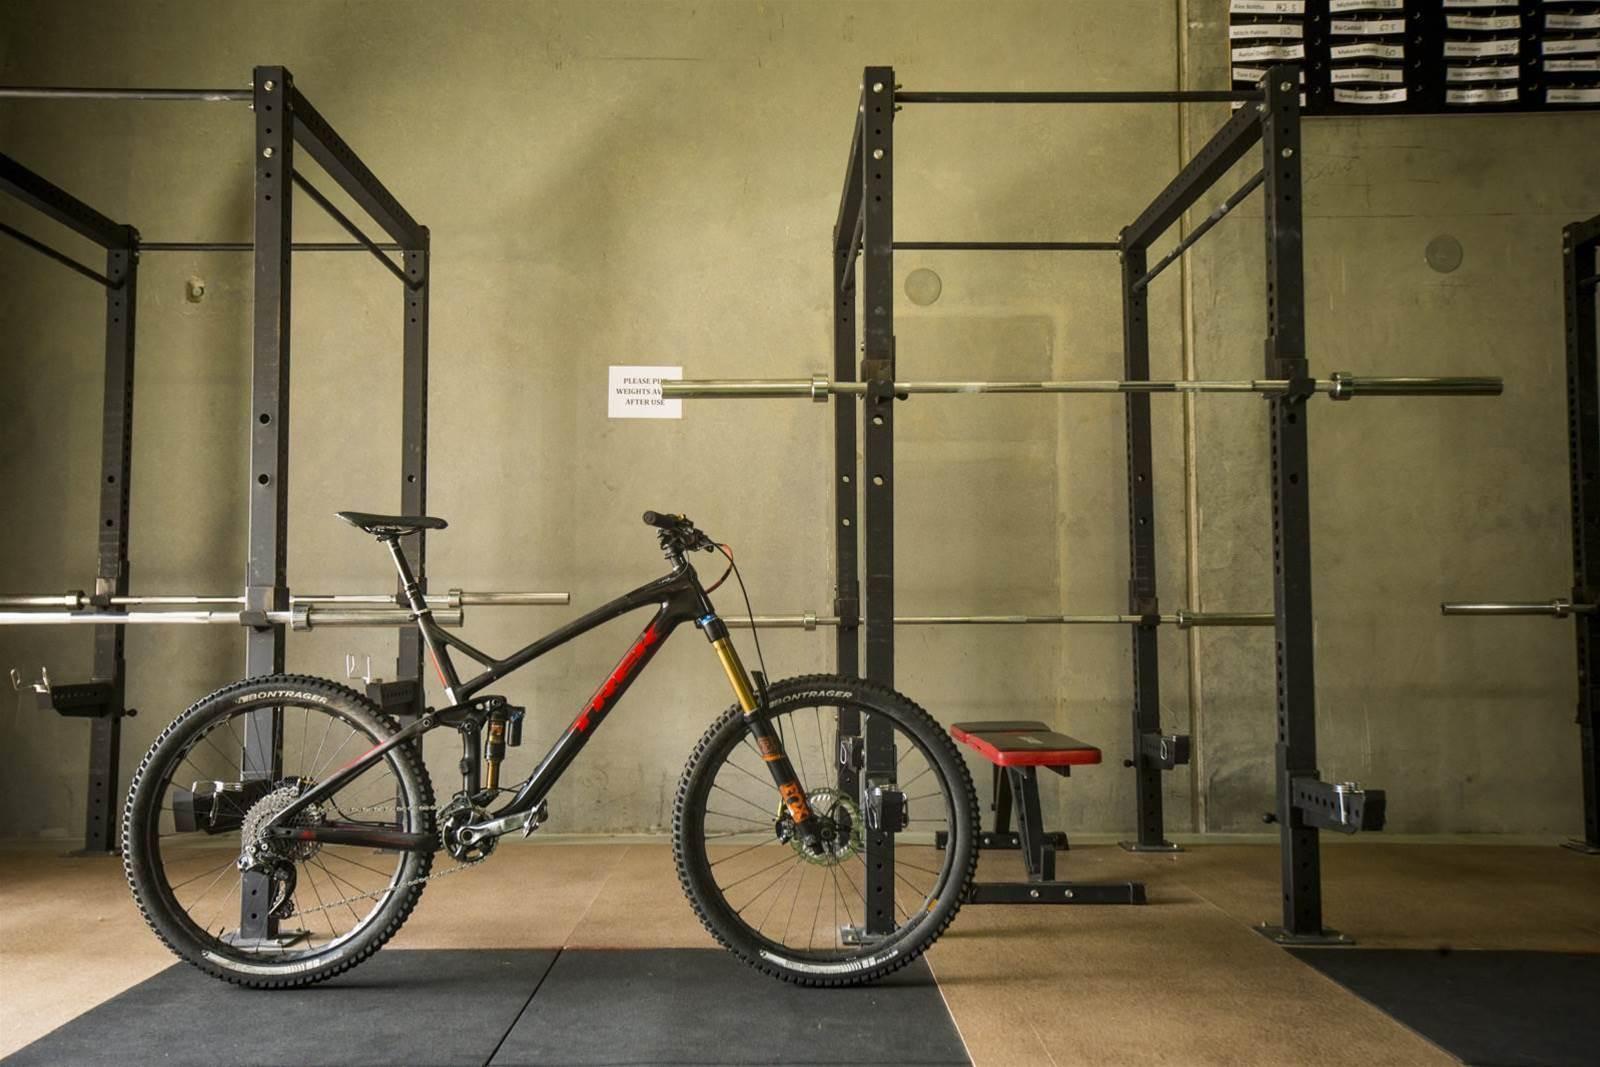 Bike Check: Chris Panozzo's Trek Slash